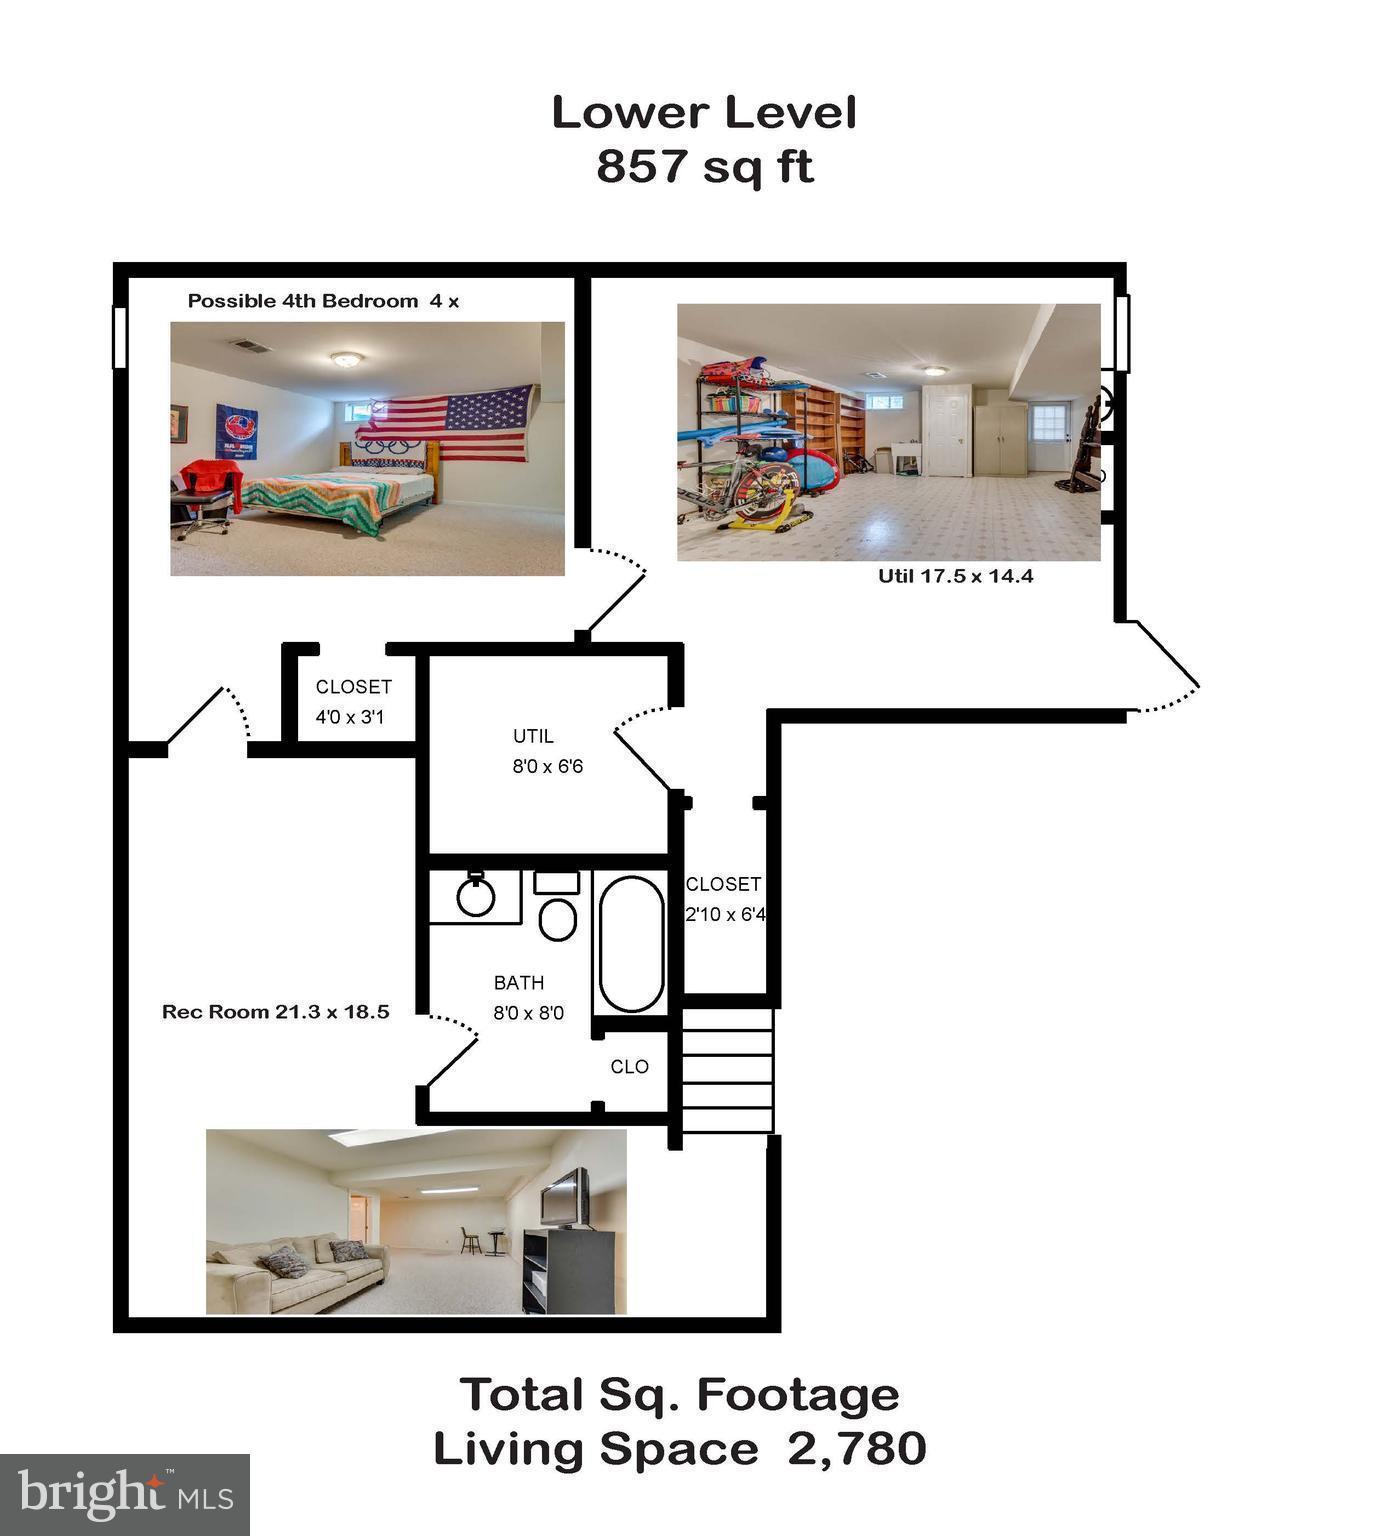 51 CASTLEROCK LN, Martinsburg, WV 25405 $255,000 www.klaassehomes ...